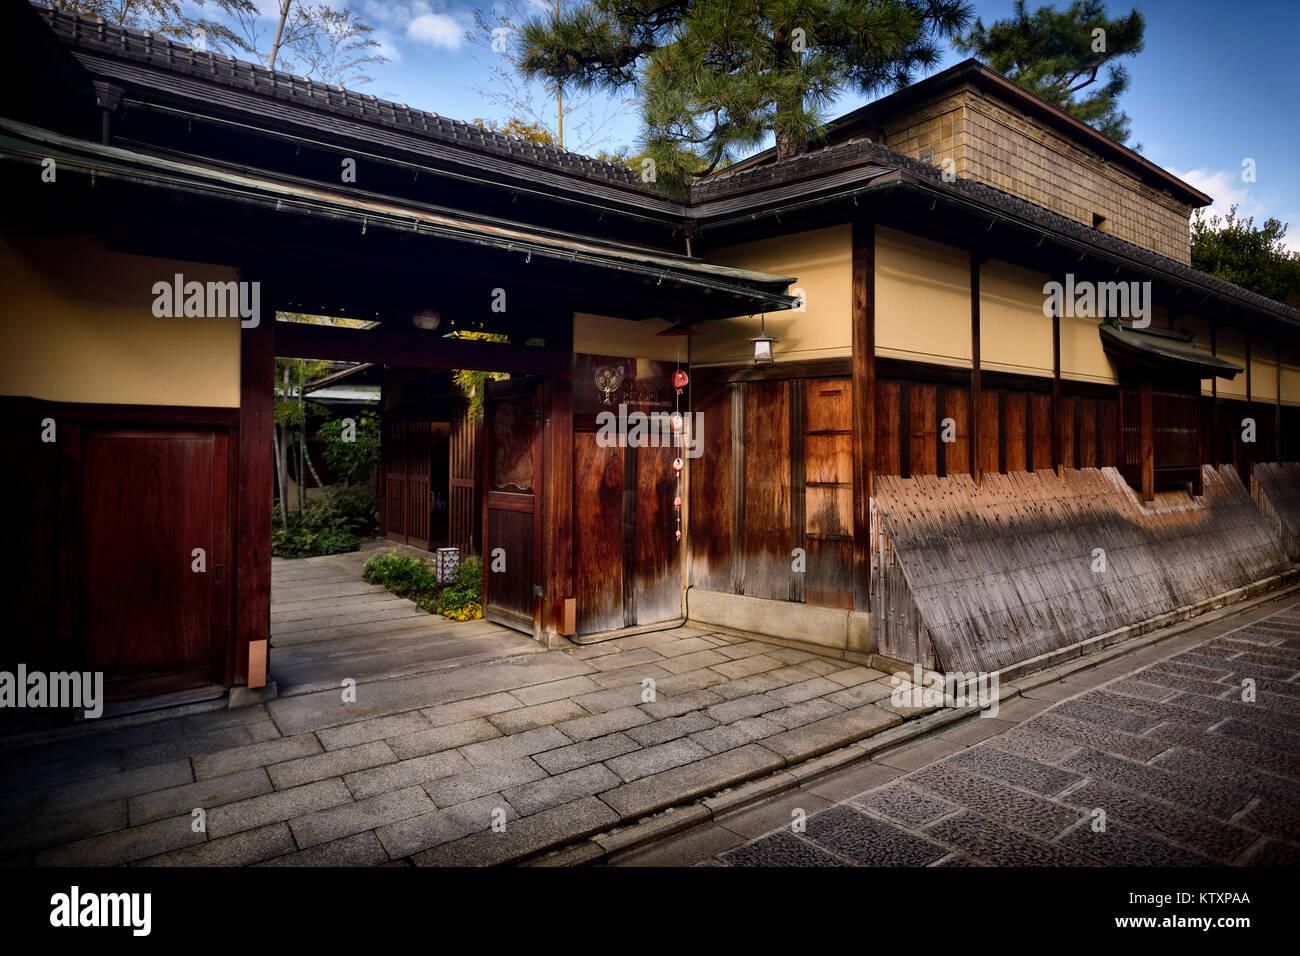 Akagane Resort Kyoto Higashiyama Japanese Restaurant Front Entrance Stock Photo Alamy